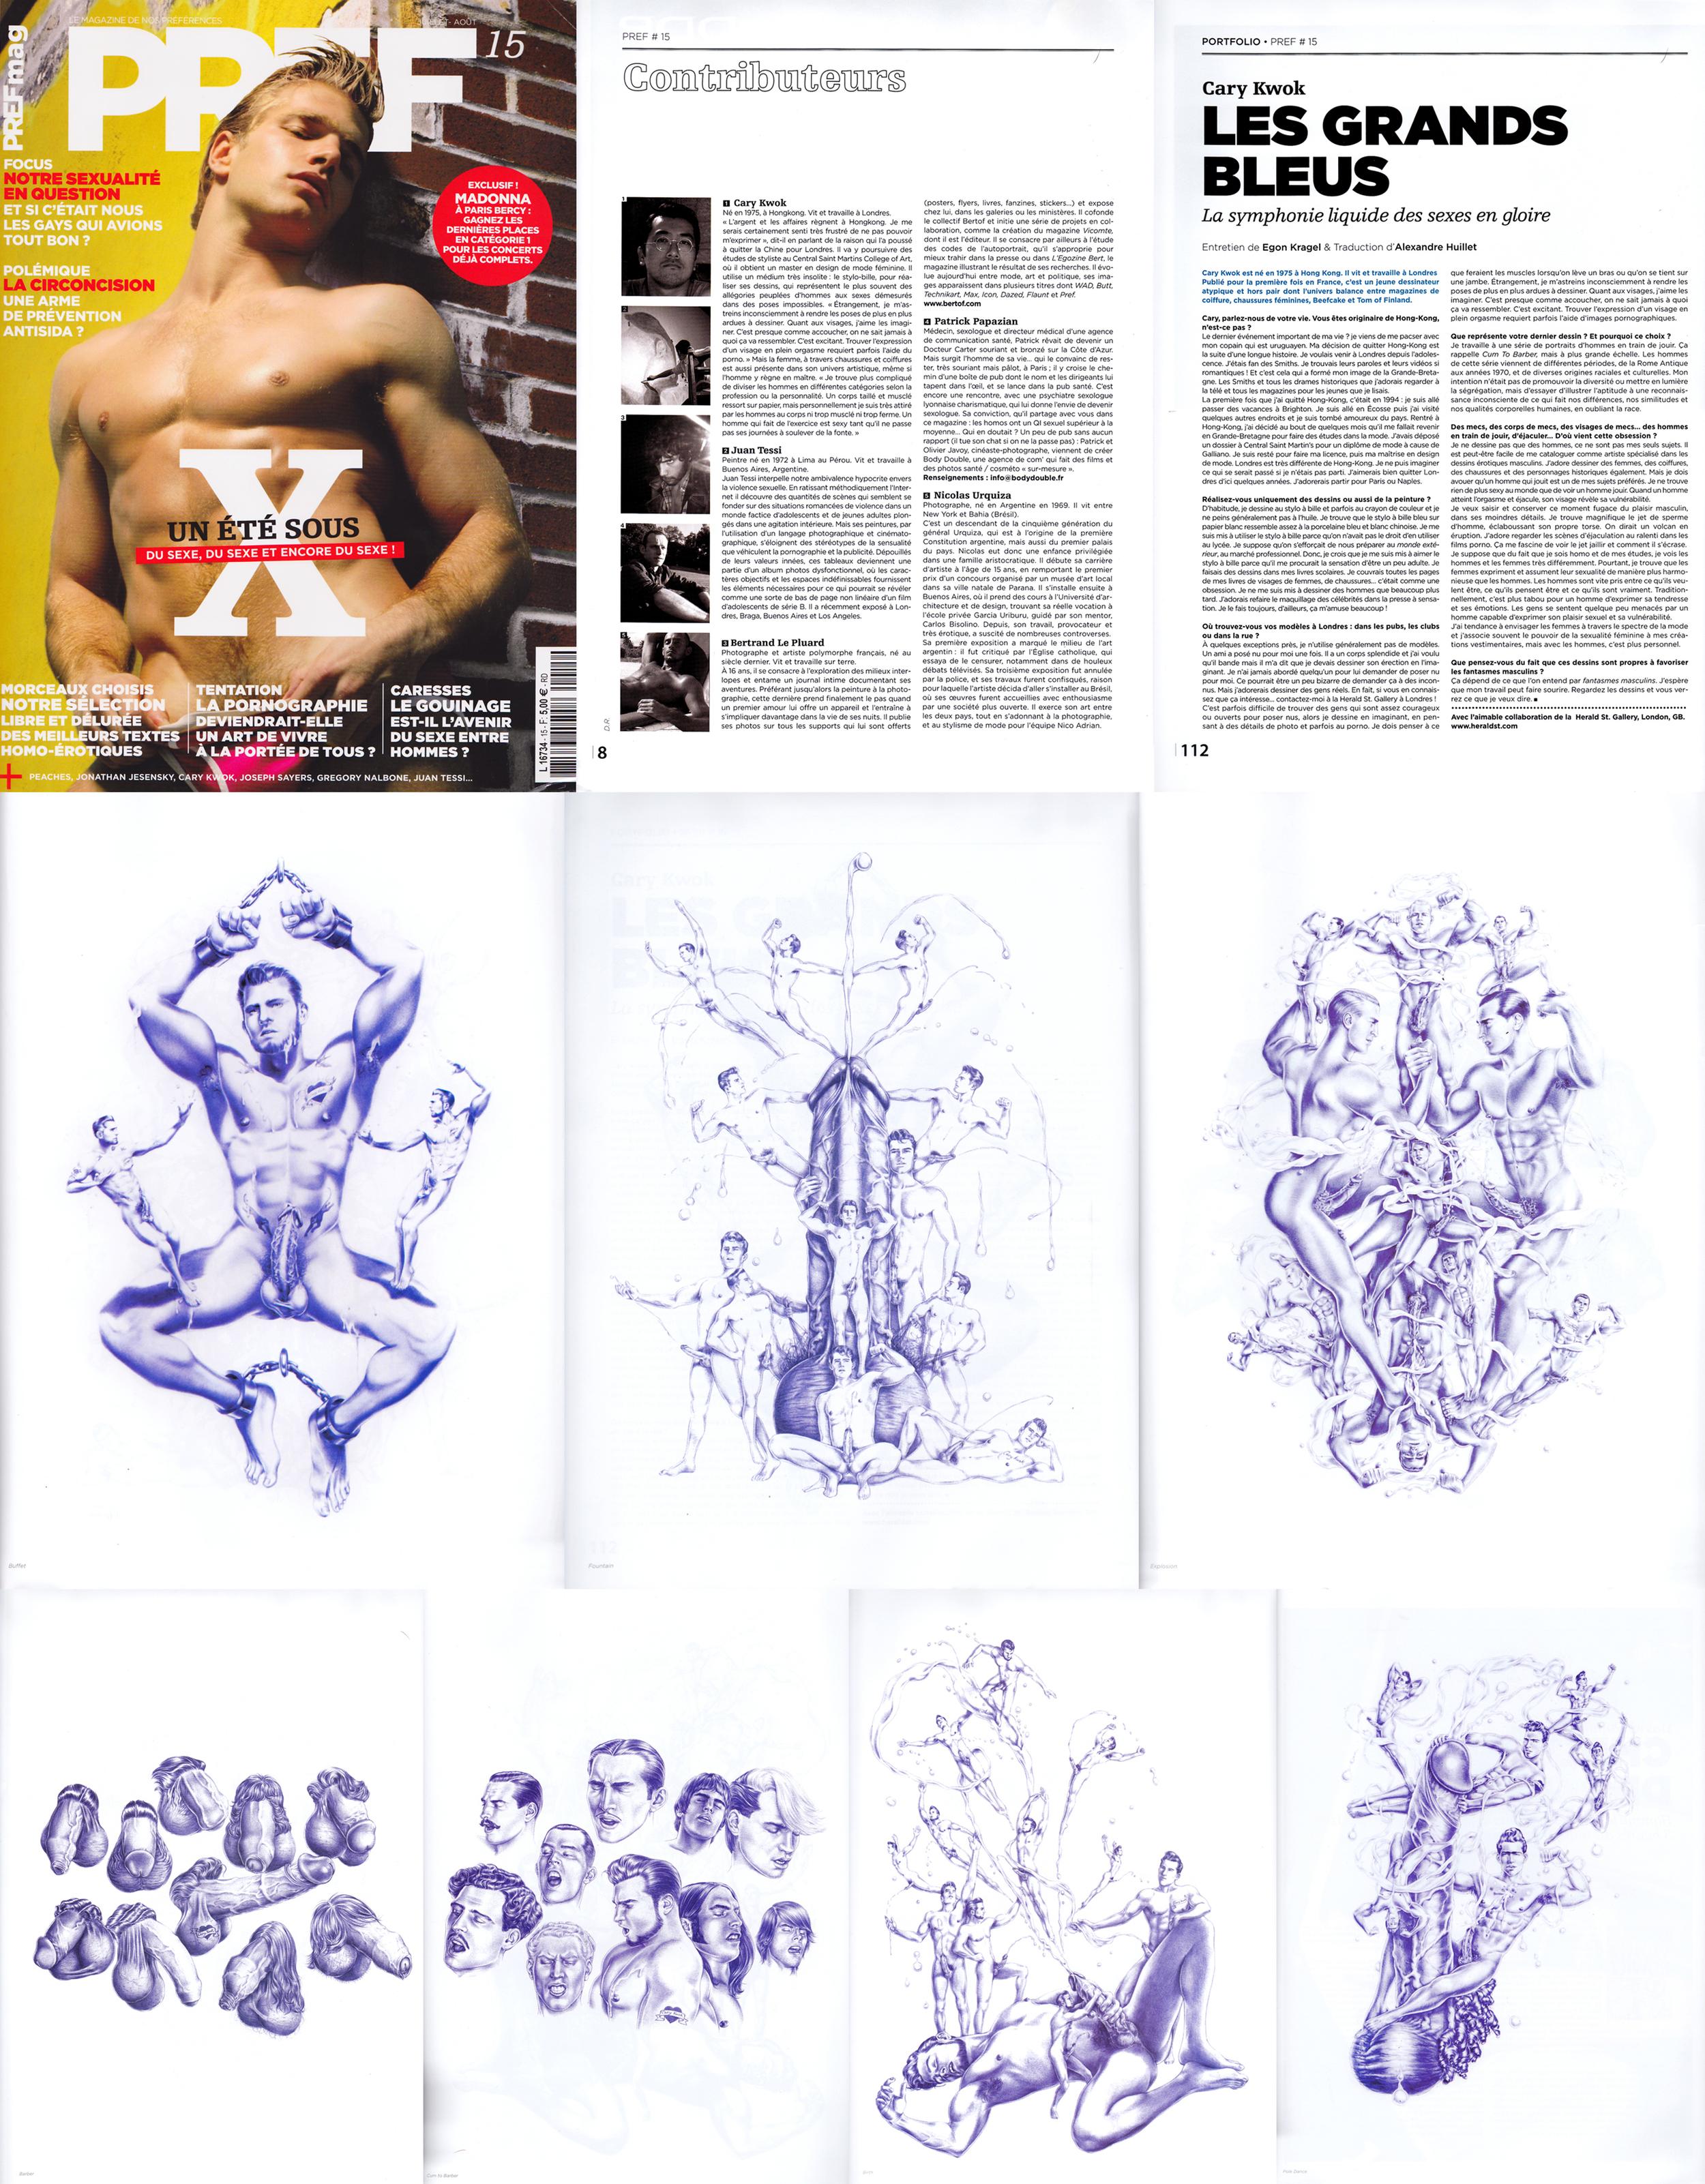 Cary Kwok - Pref Magazine No 15 (Interview) - July-August2006 (e).jpg